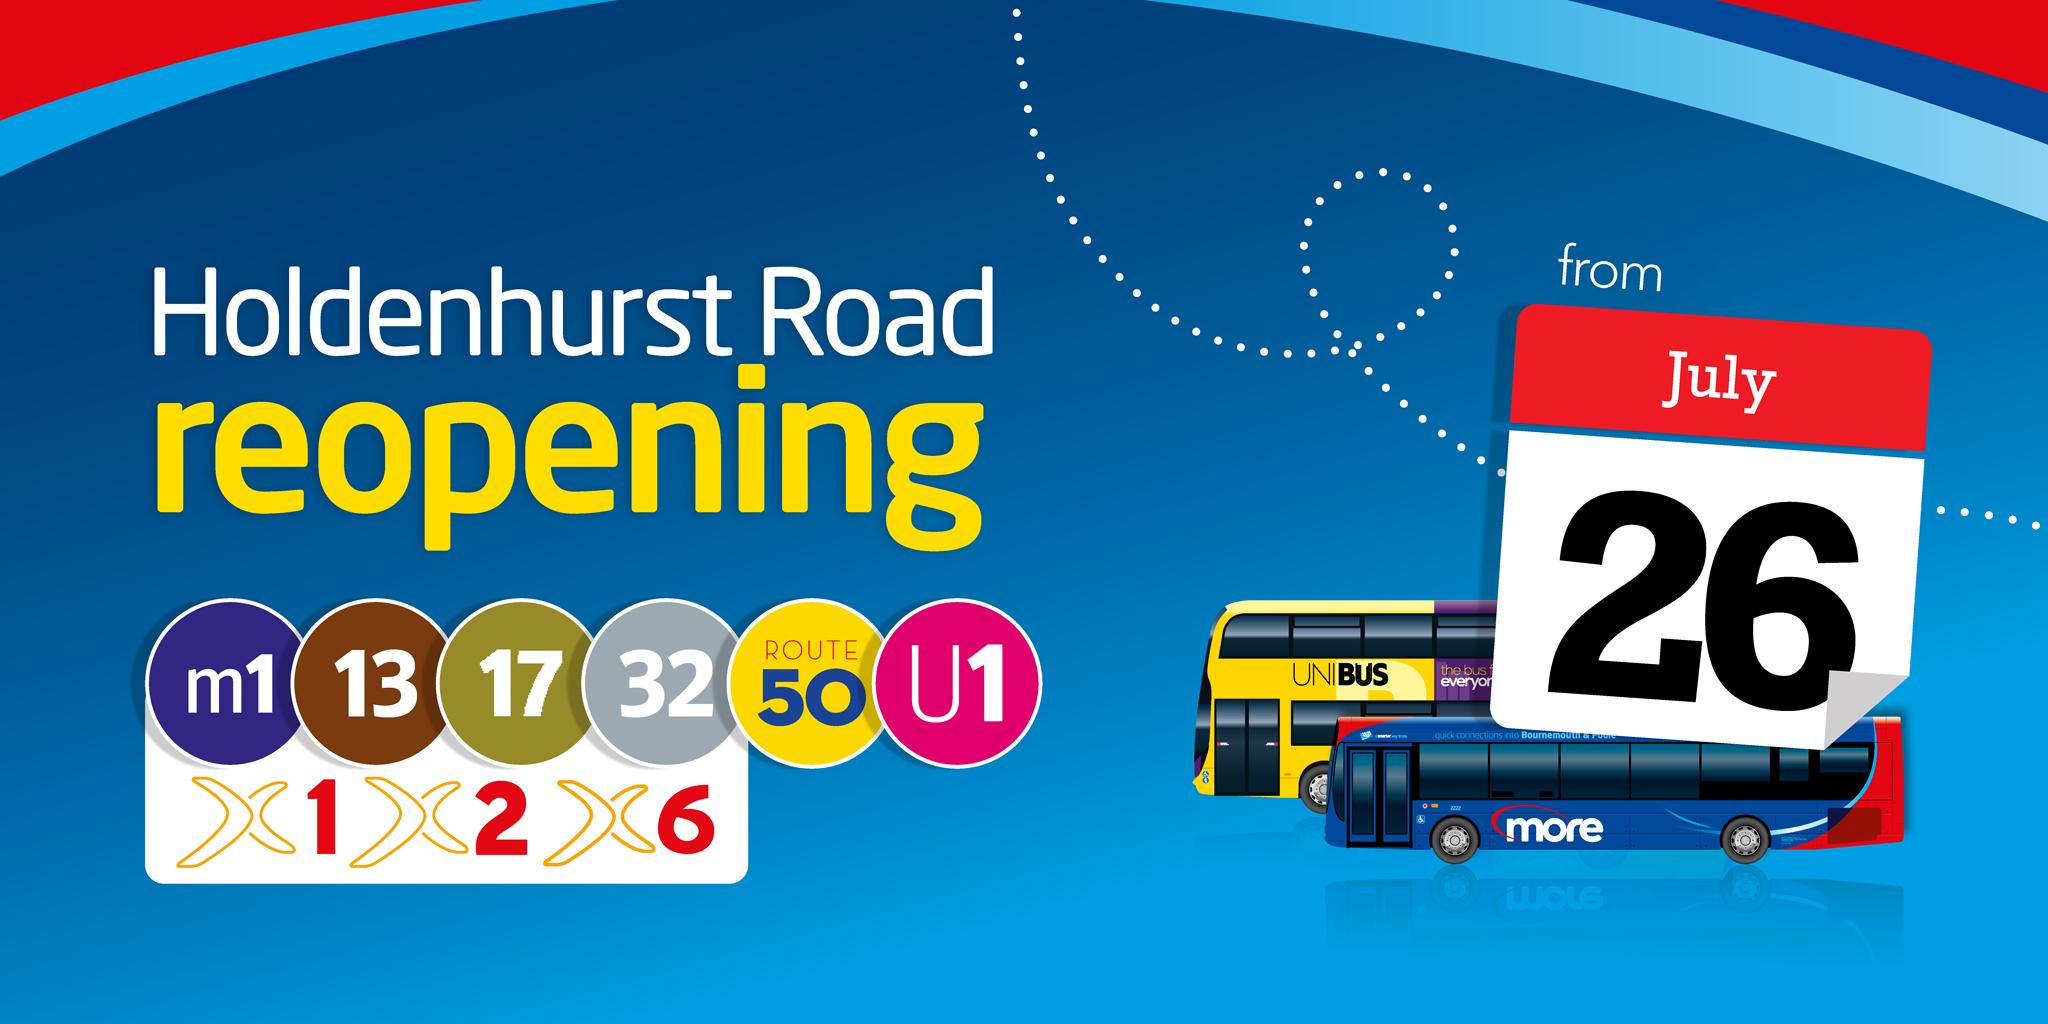 holdenhurst road reopening 26th july